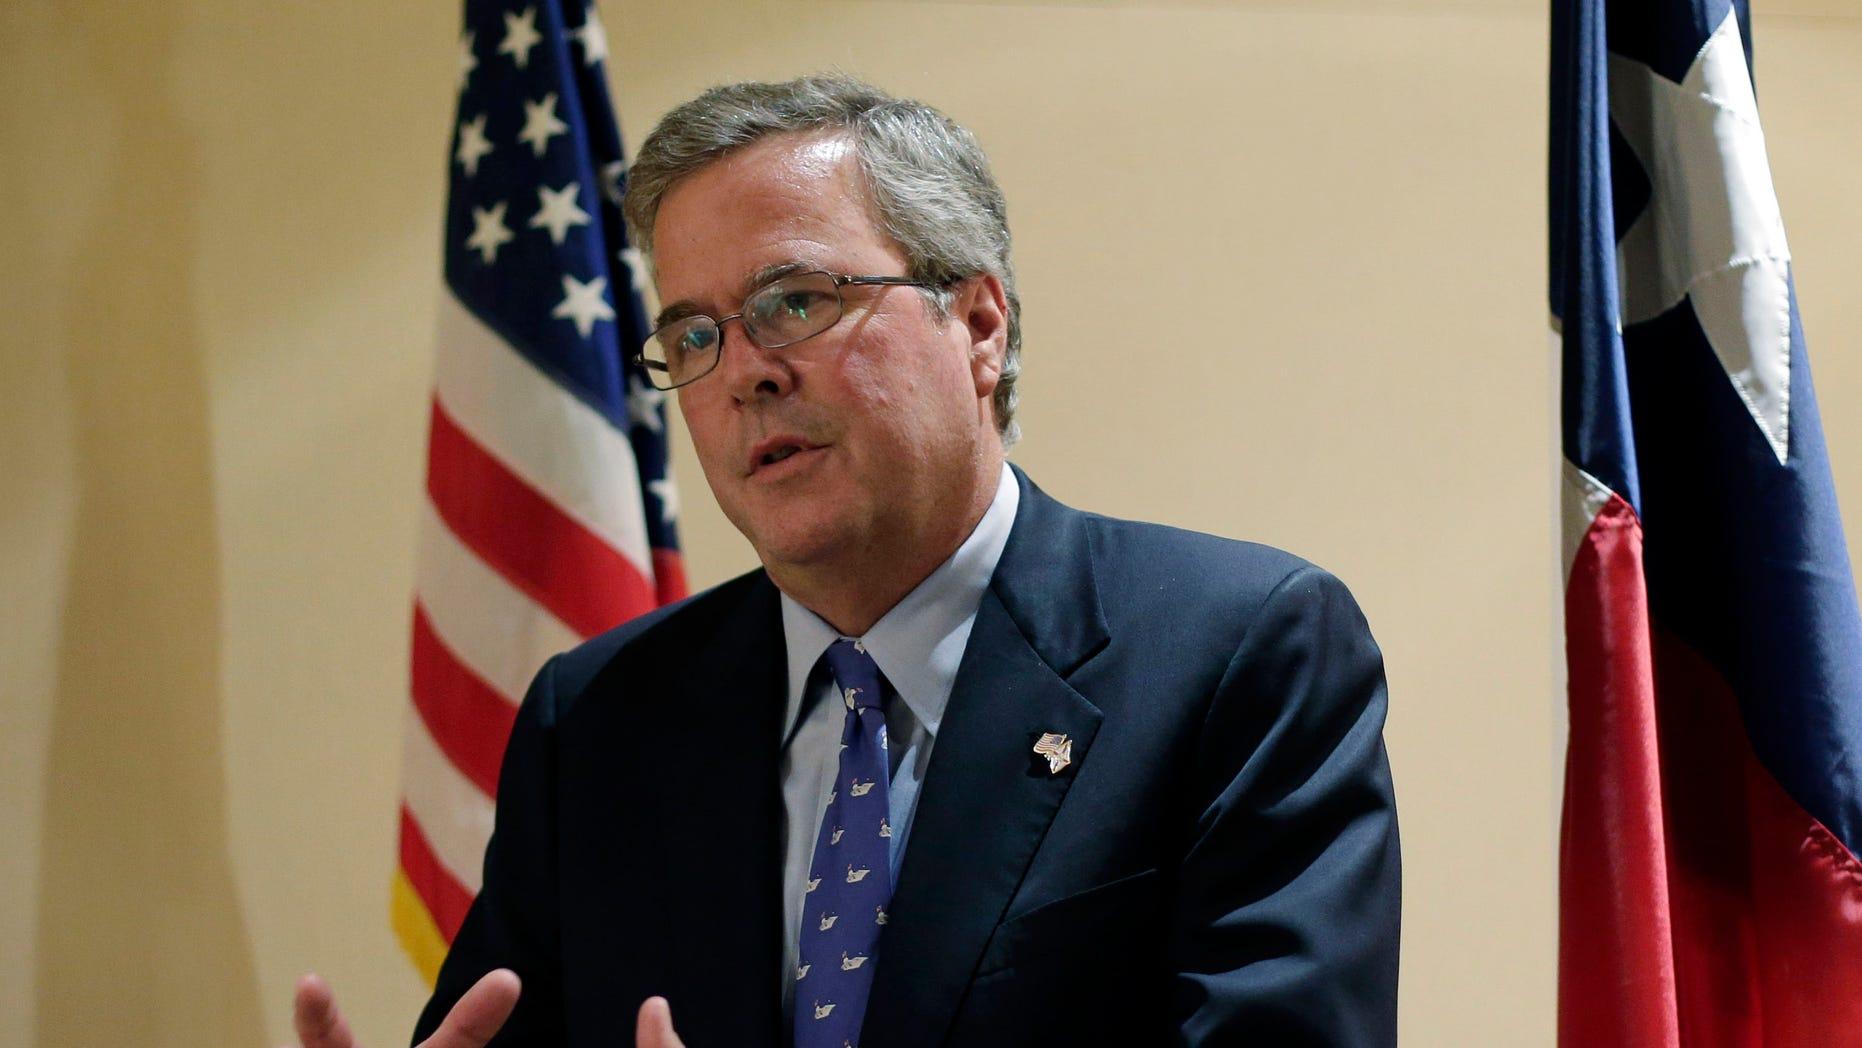 FILE: Feb. 26, 2013: Former Florida Gov. Jeb Bush, R, at a Texas Business Leadership Council event, Austin, Texas.